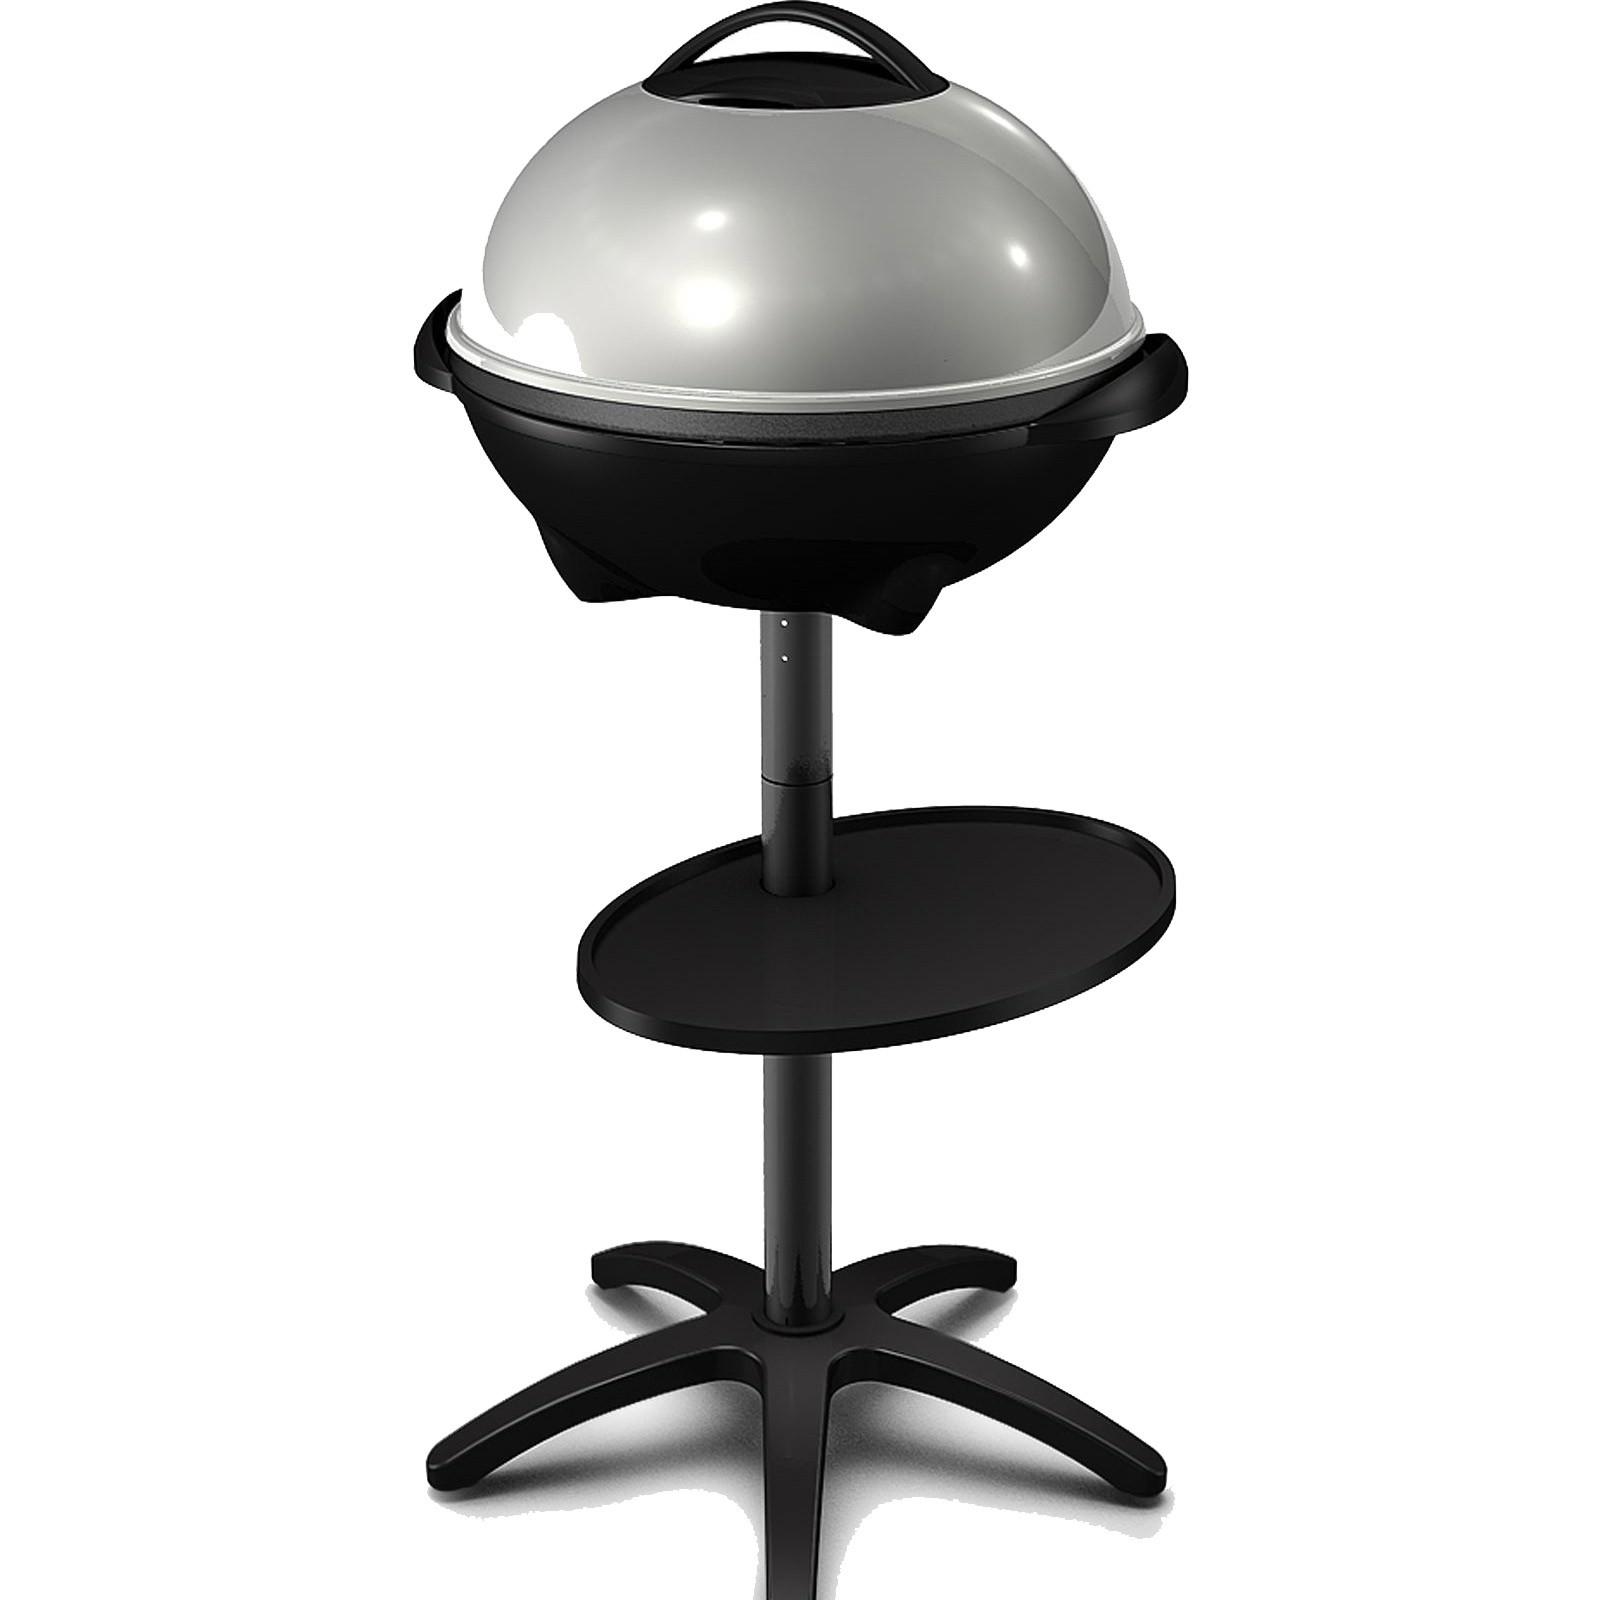 tepro elektrokugelgrill minigrill partygrill bbq grill. Black Bedroom Furniture Sets. Home Design Ideas